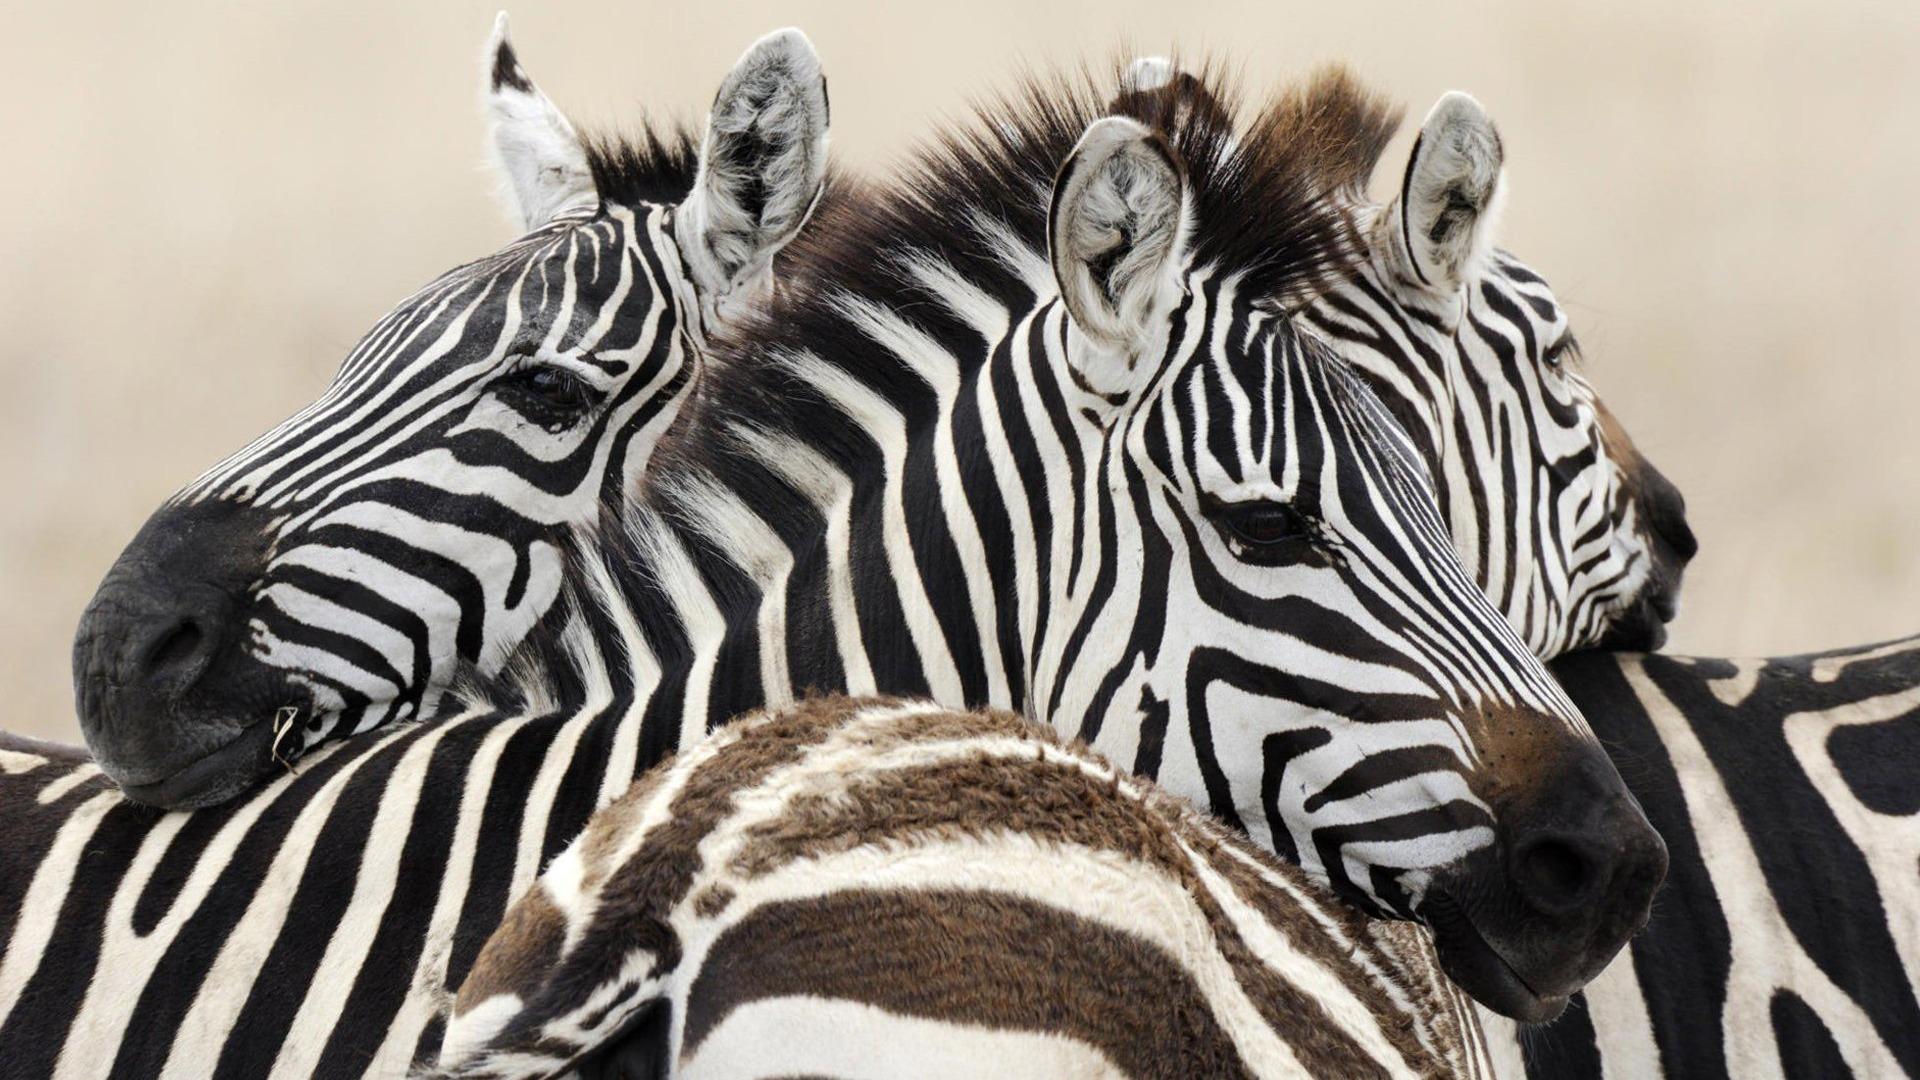 Wallpaper zebra hd wallpapers for Zebra wallpaper